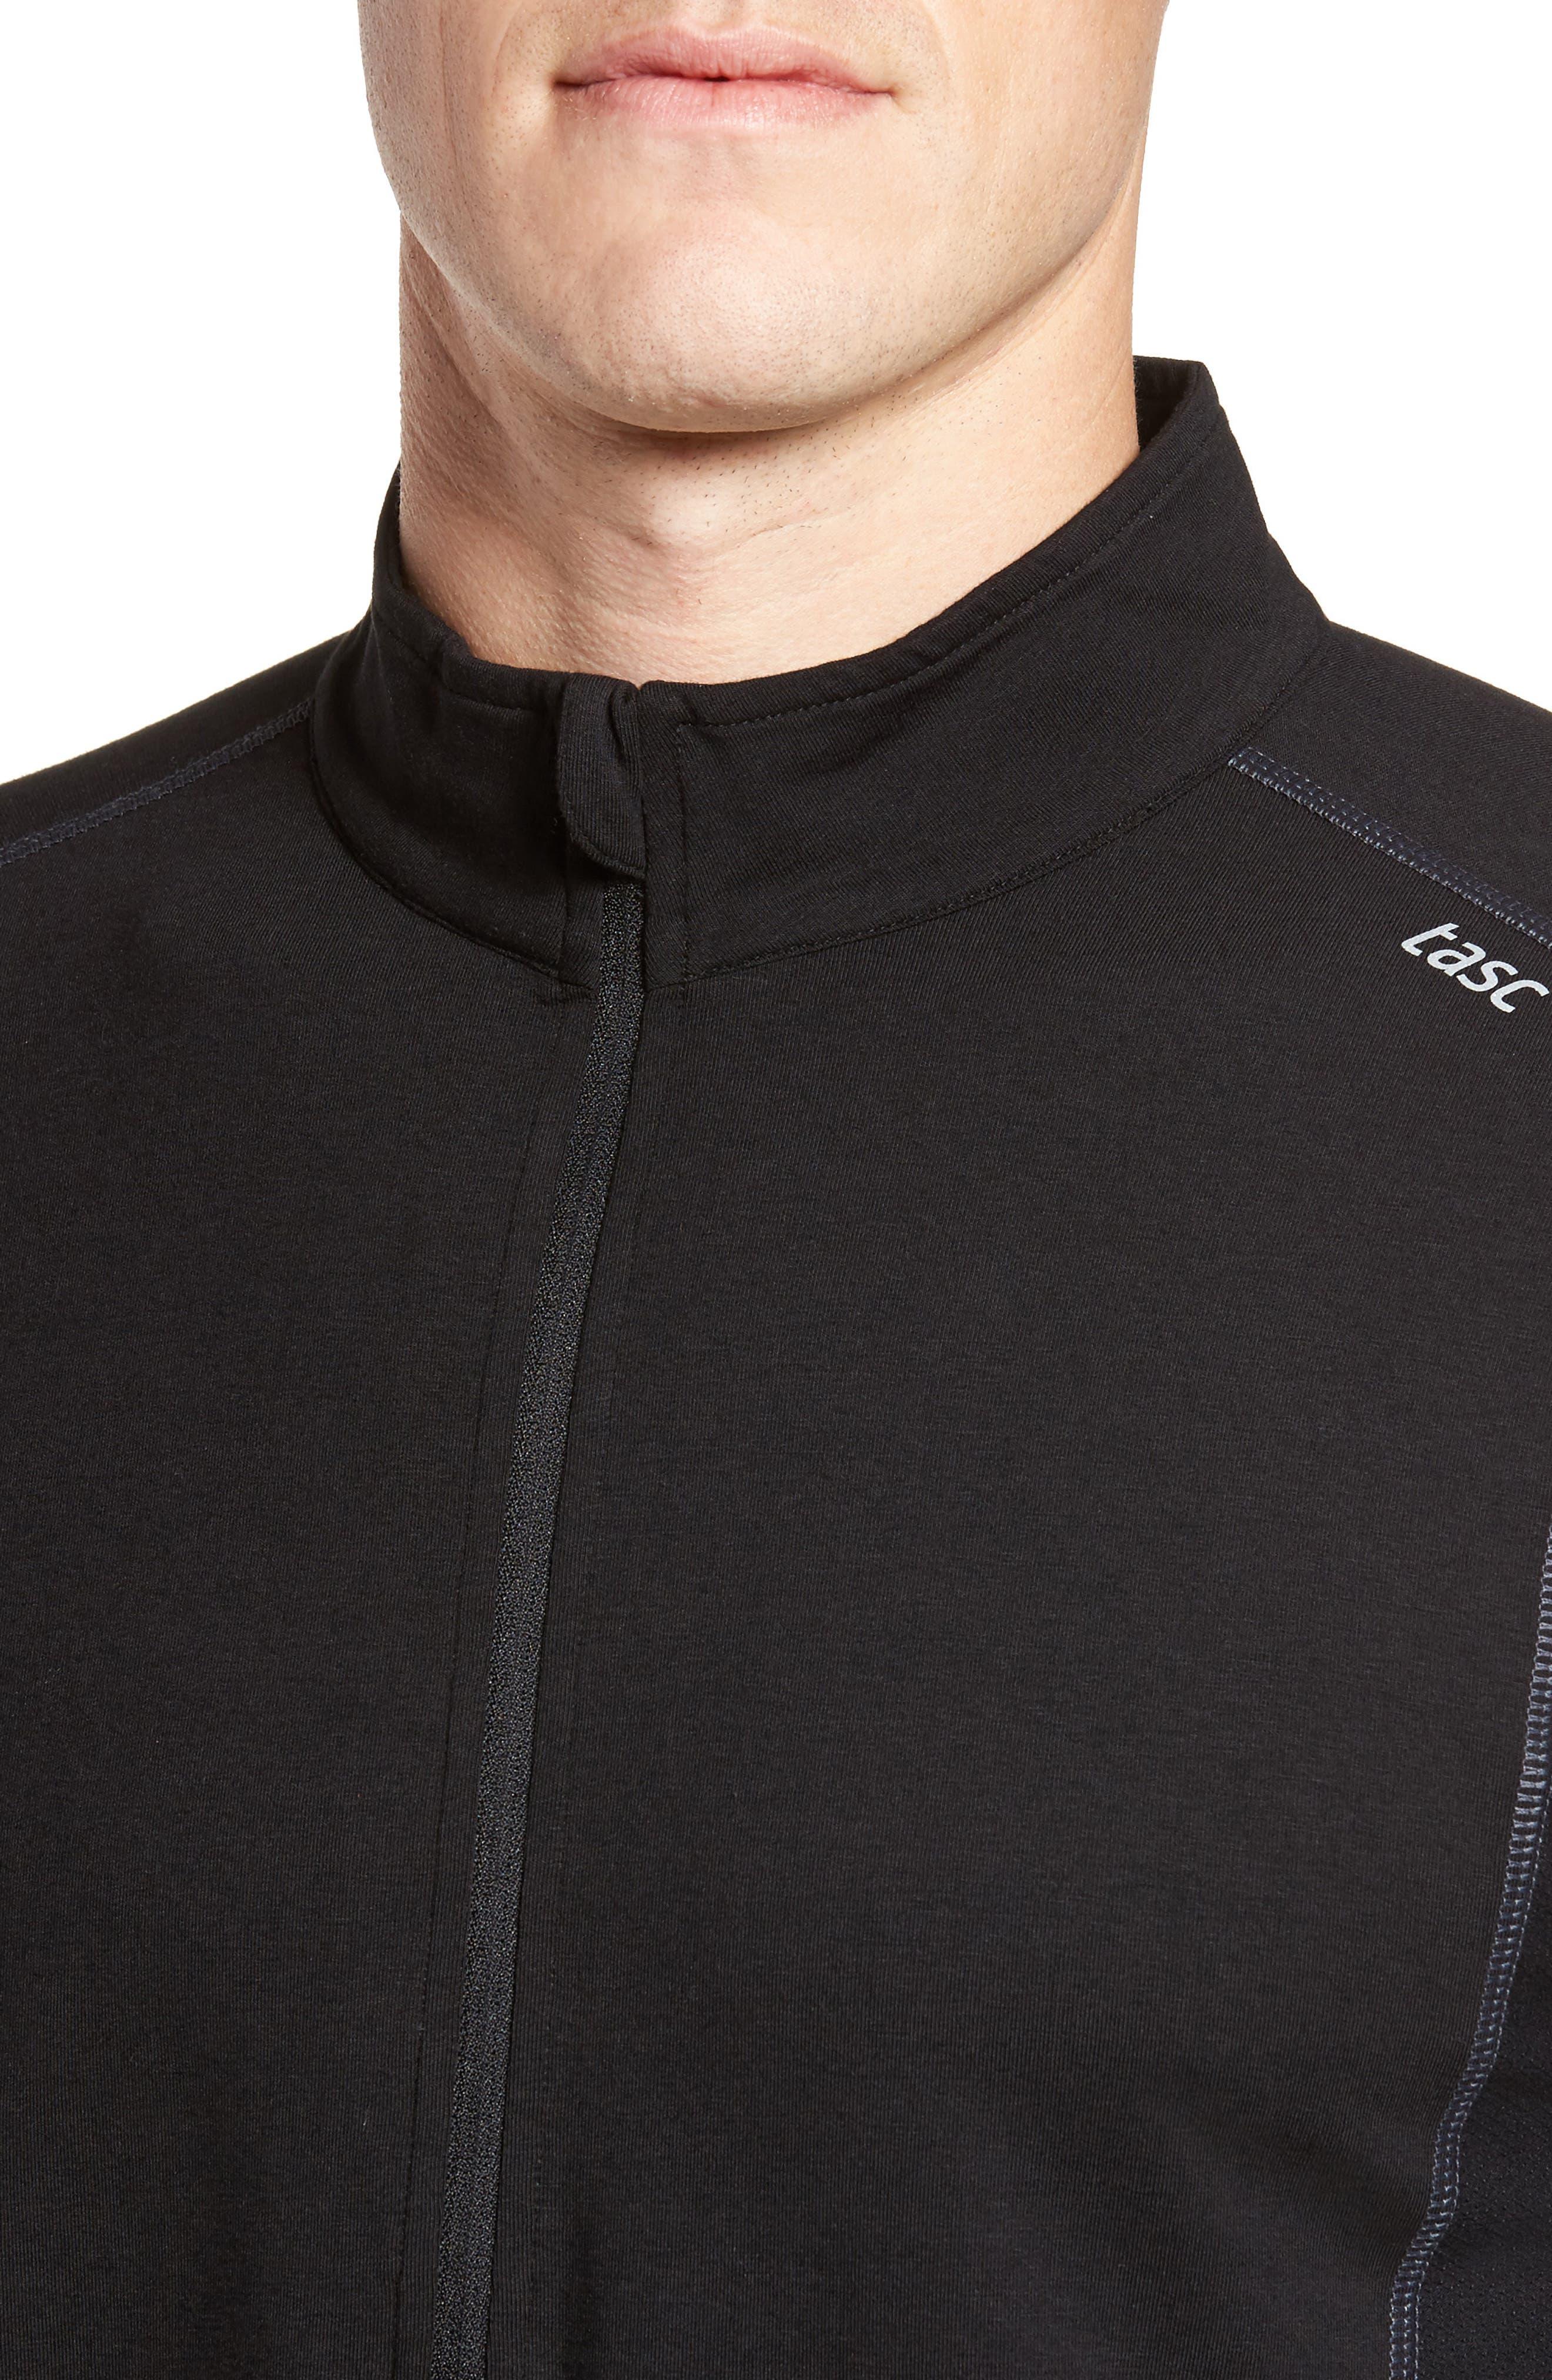 Charge Quarter-Zip Pullover,                             Alternate thumbnail 4, color,                             Black/ Gunmetal